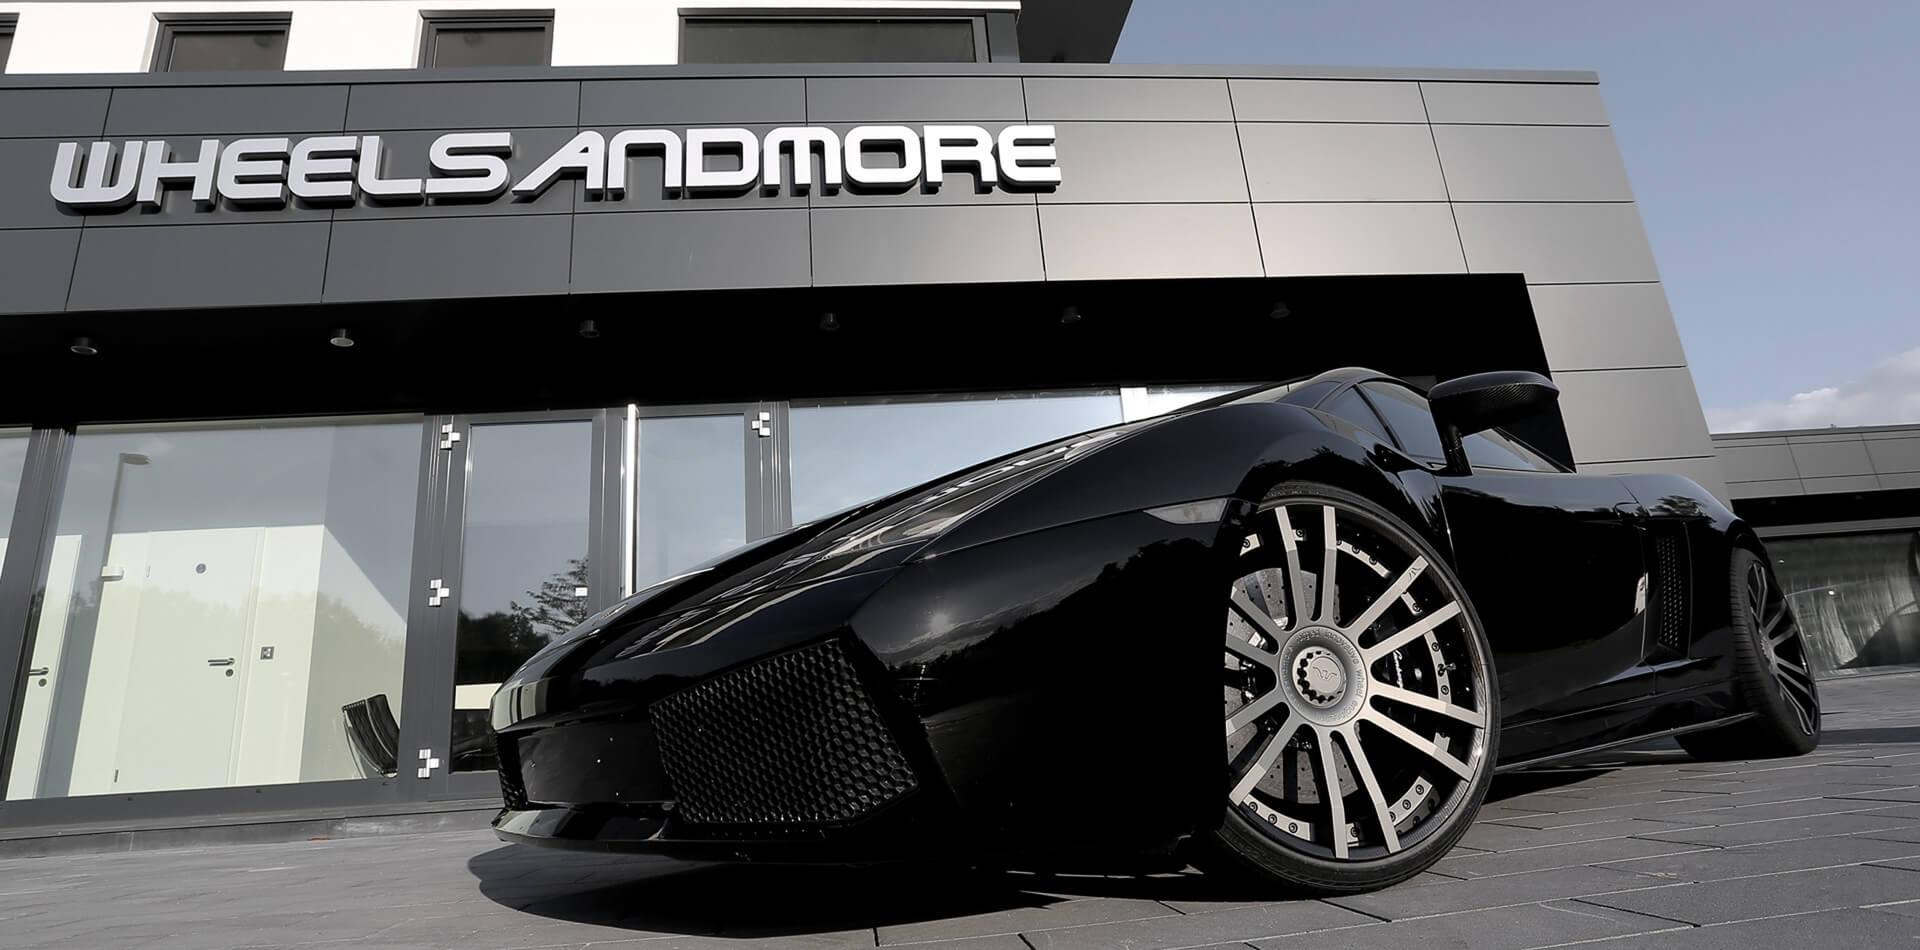 Lamborghini_Fahrwerk_Superleggera-1